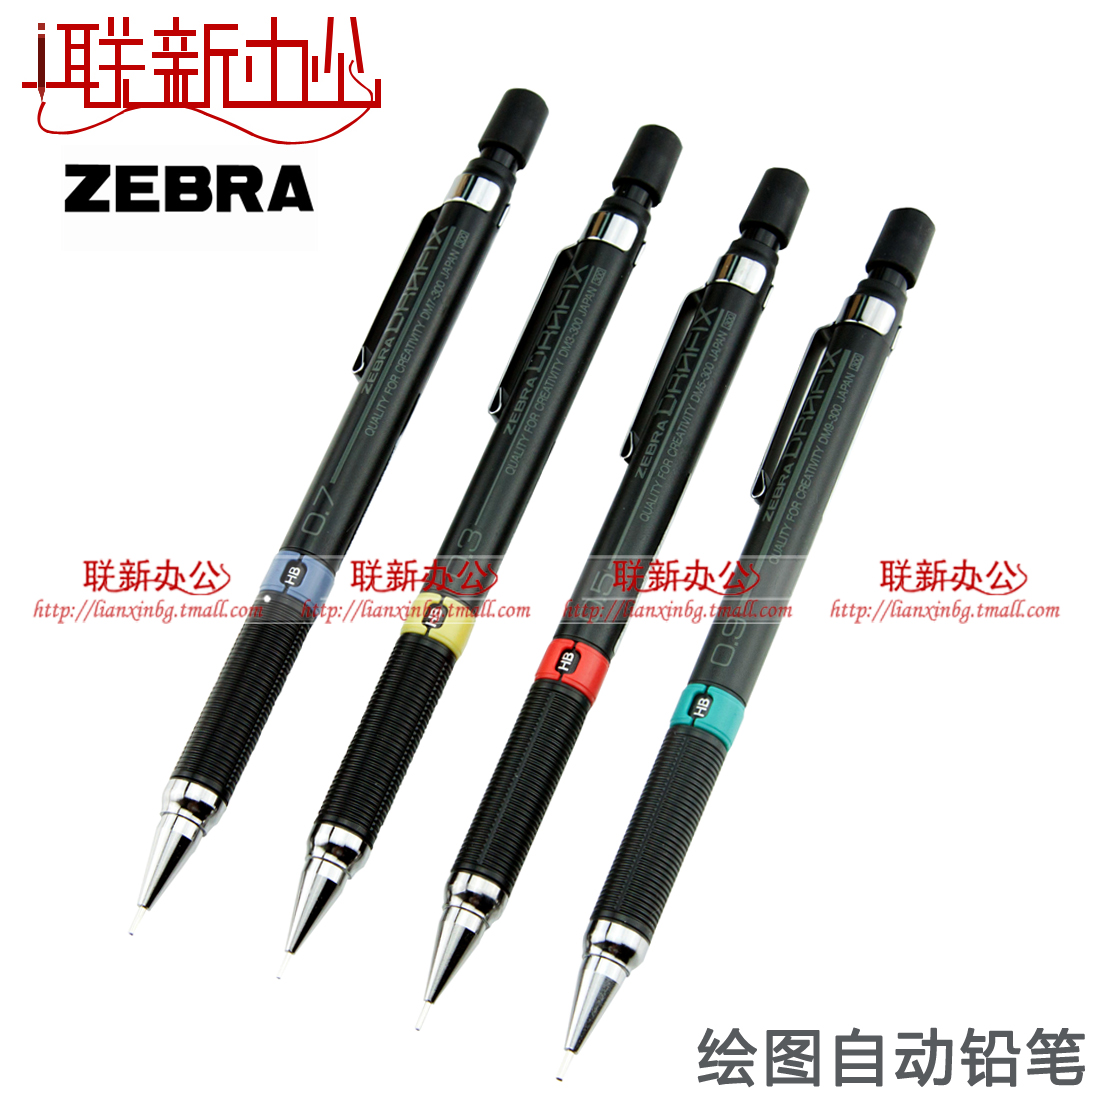 Набор карандашей ZEBRA  DM5-300/0.3/0.5/0.7/0.9